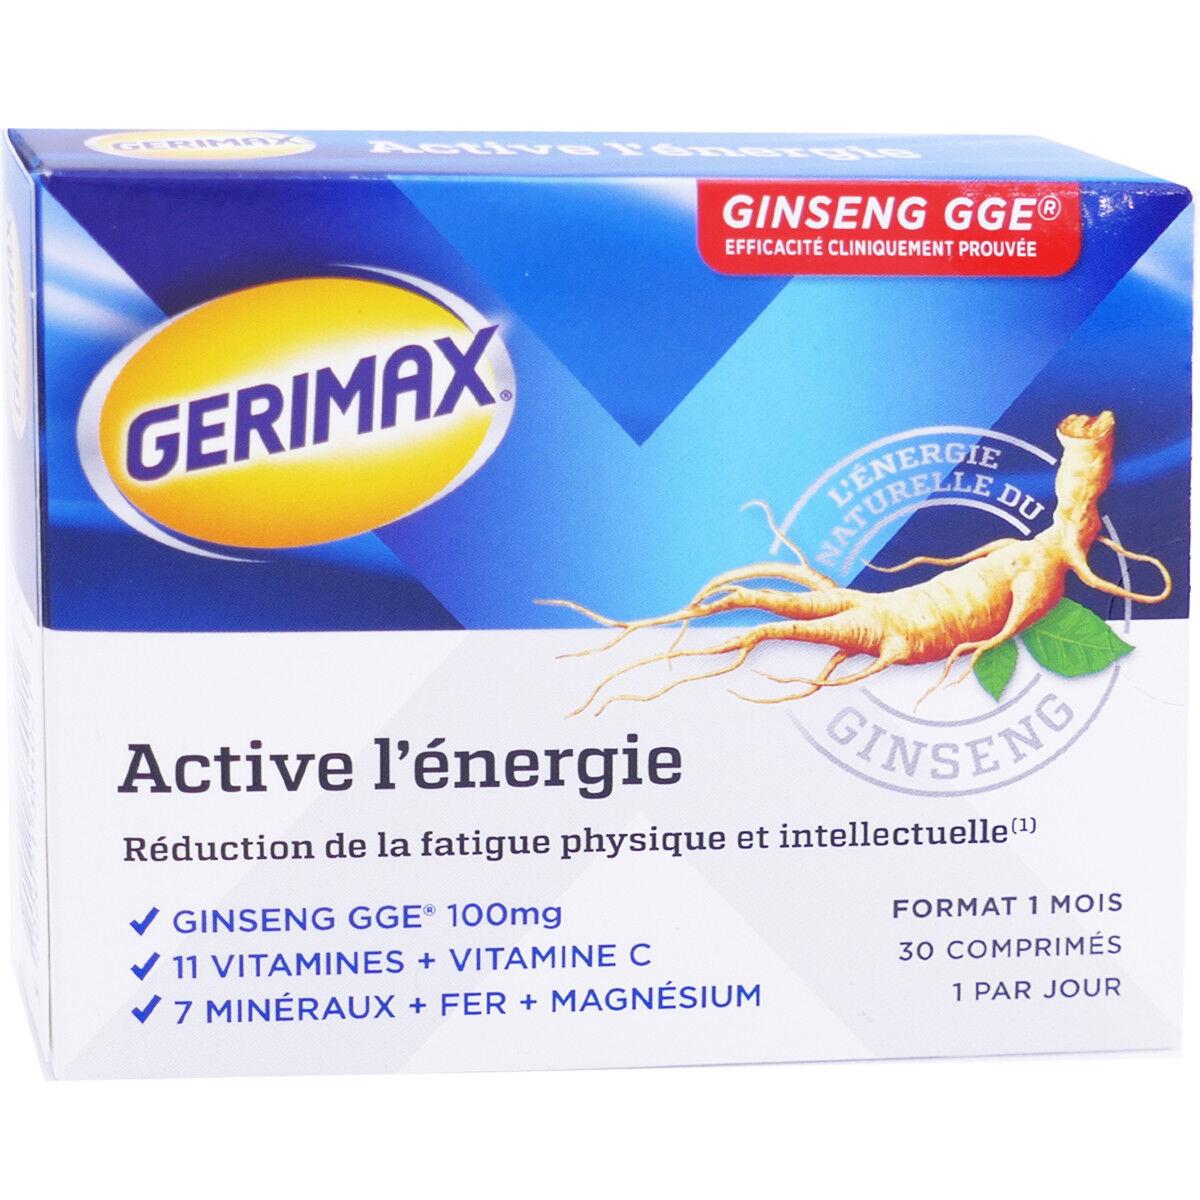 PHARM UP Gerimax ginseng gge 30 comprimes